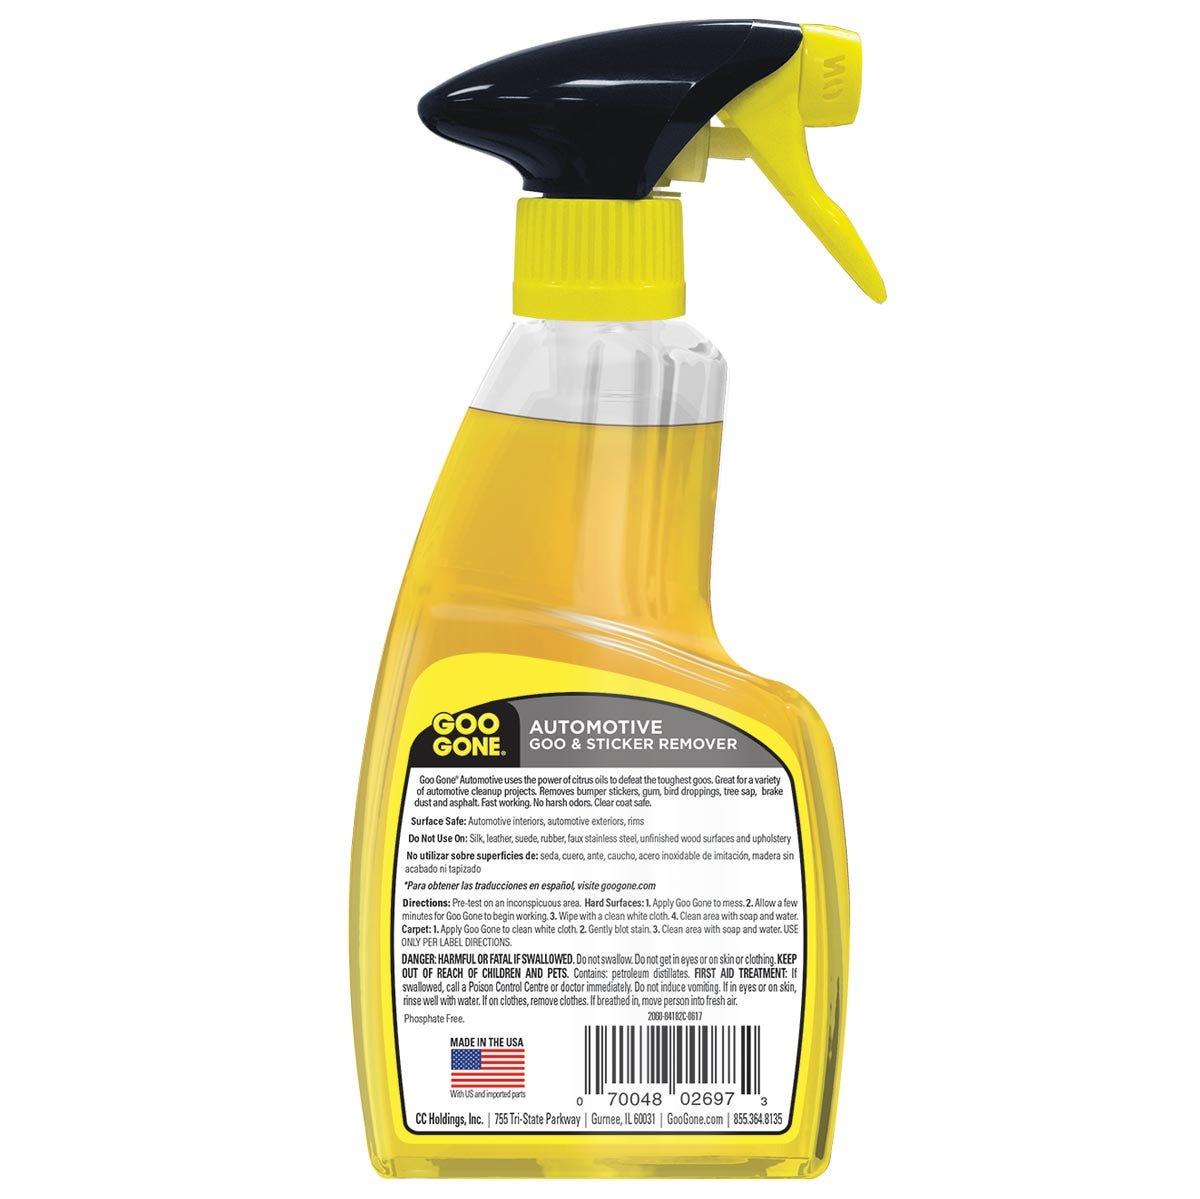 Automotive Adhesive Remover Spray Gel back label